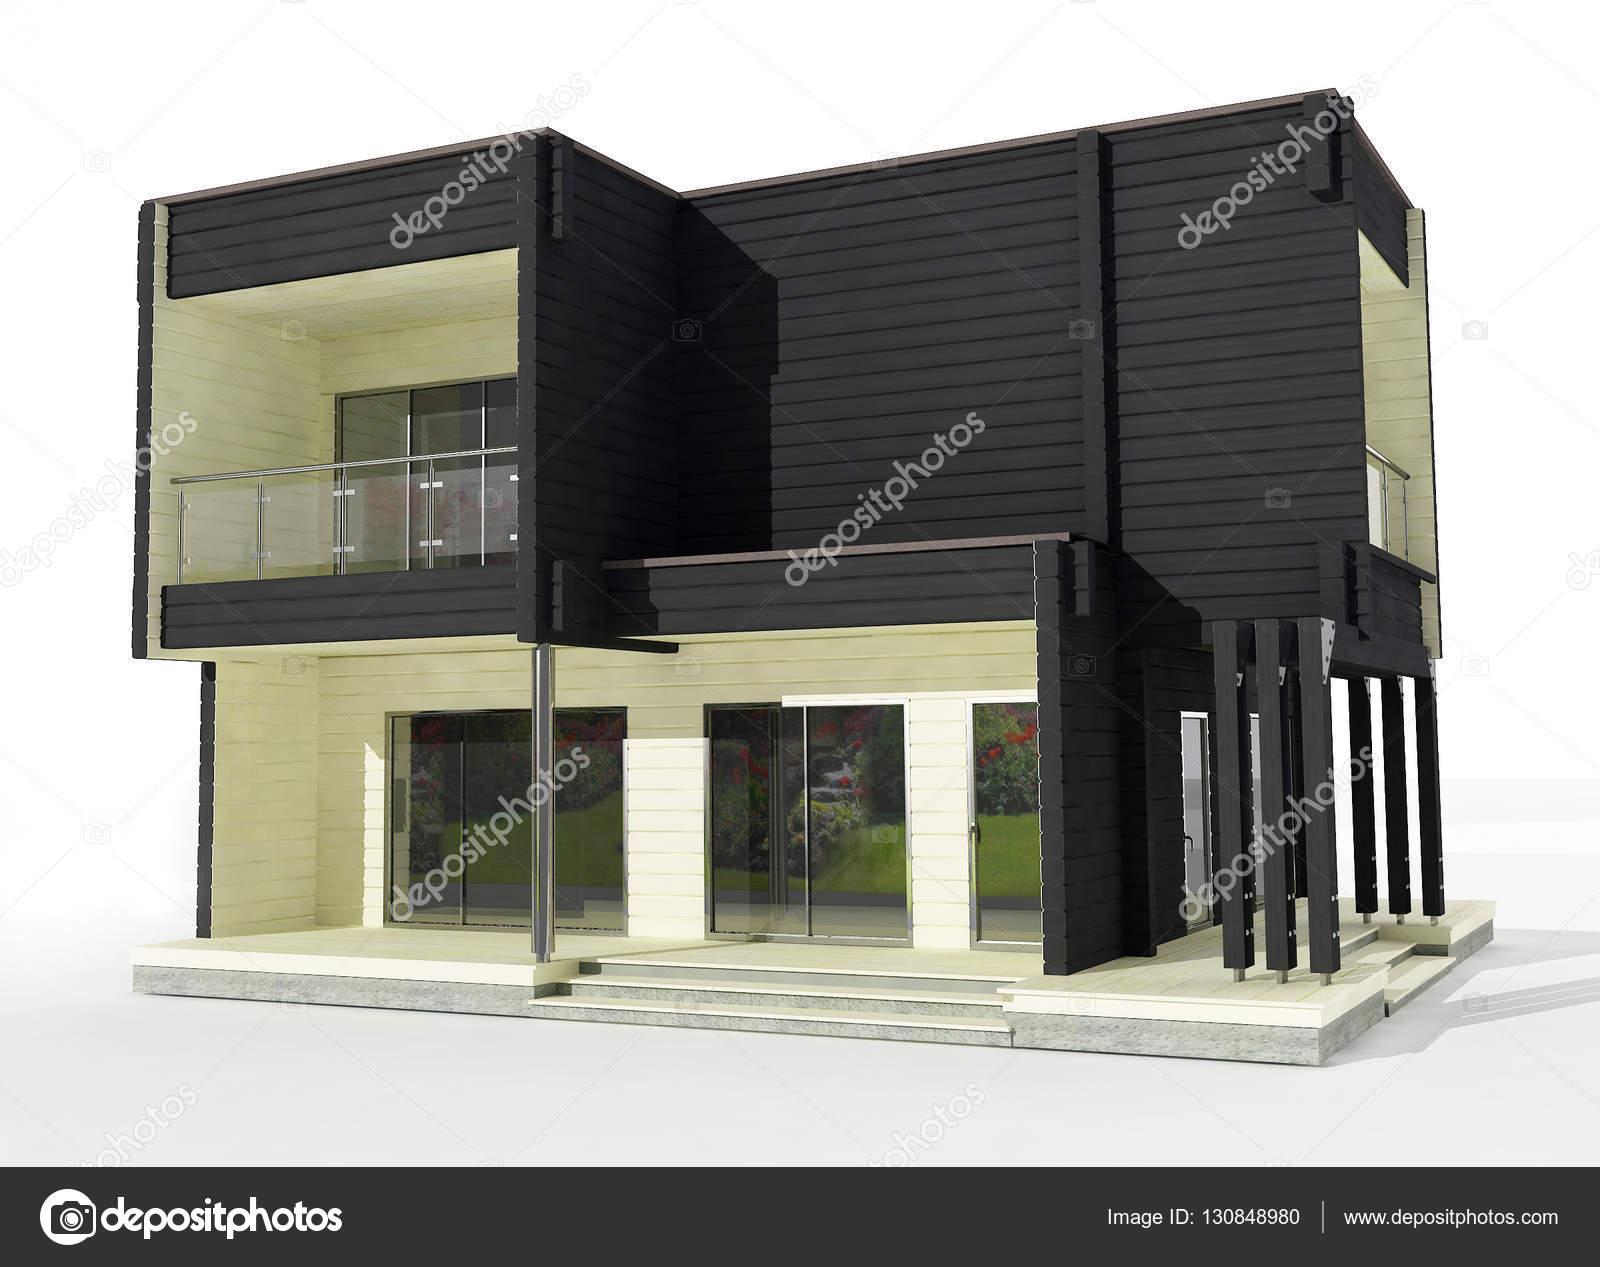 Casas 3d De Dos Pisos Modelo 3d De La Casa De Madera De Dos Pisos